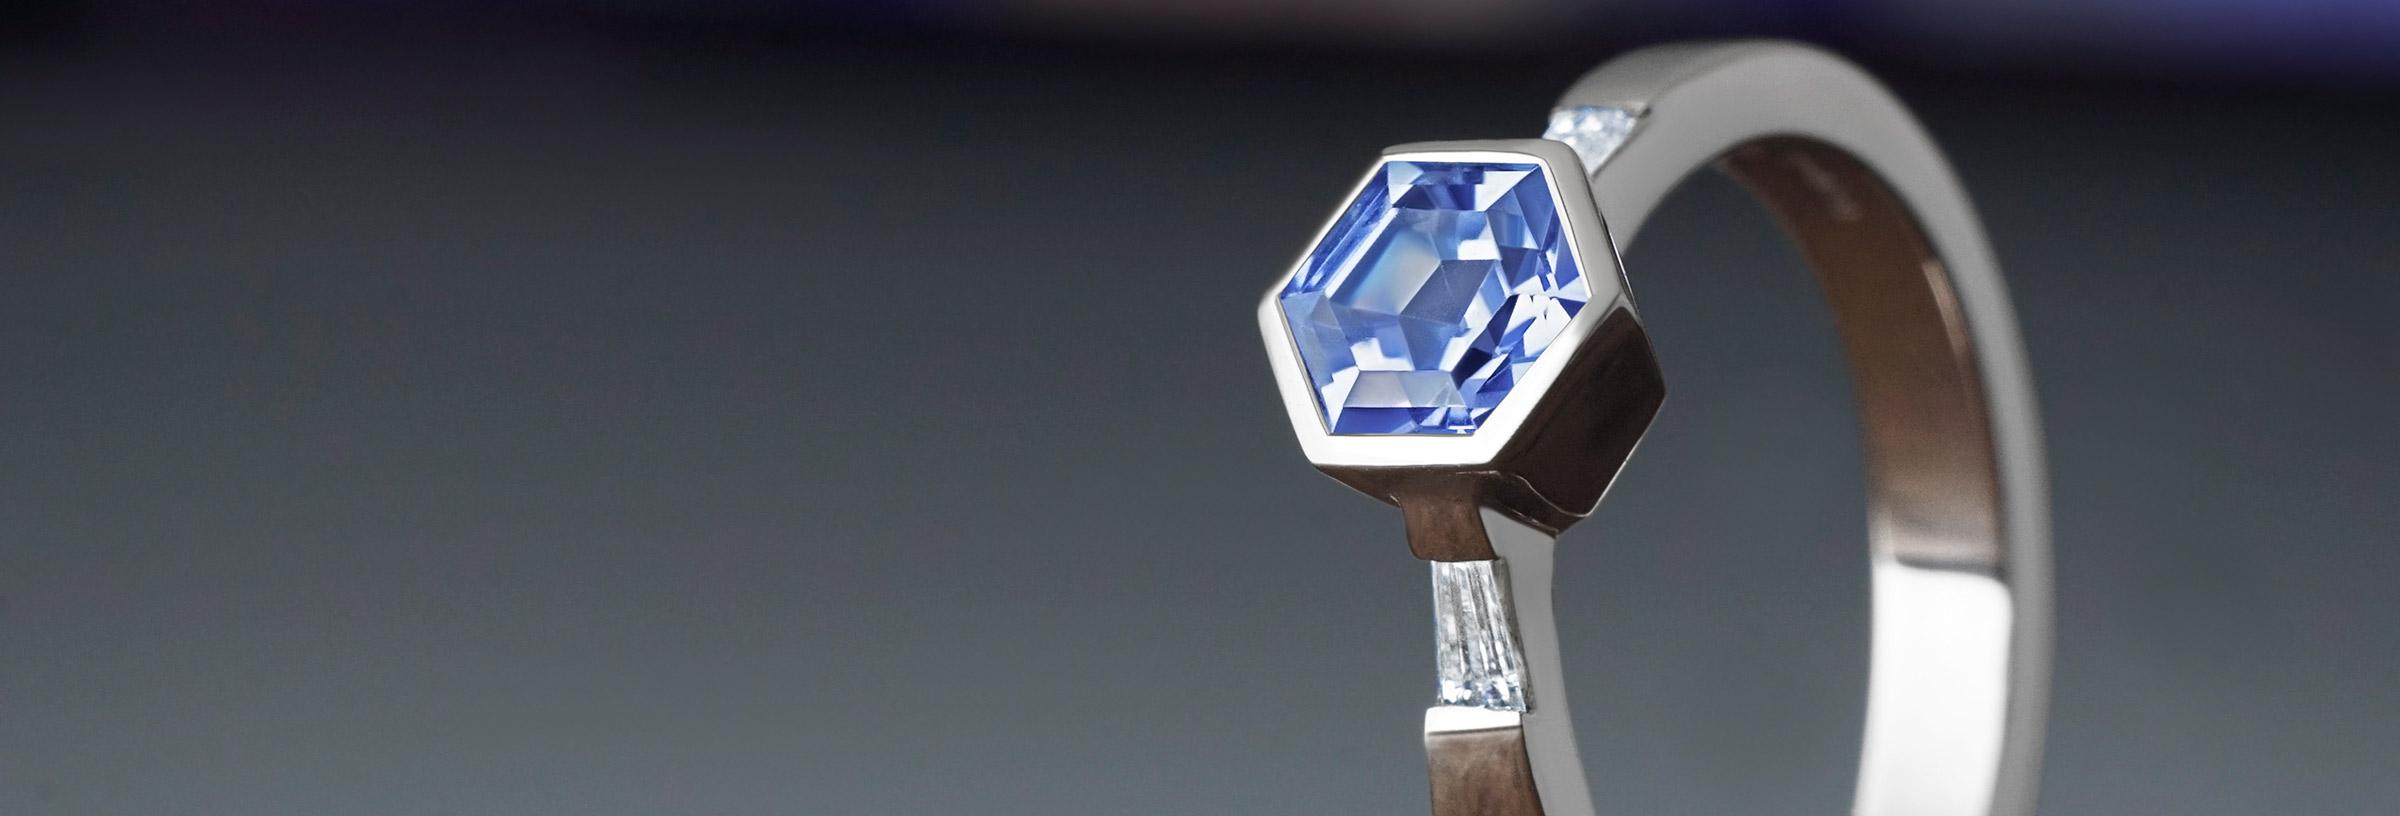 Rare 0.95ct hexagonal blue sapphire, diamond and recycled palladium engagement ring